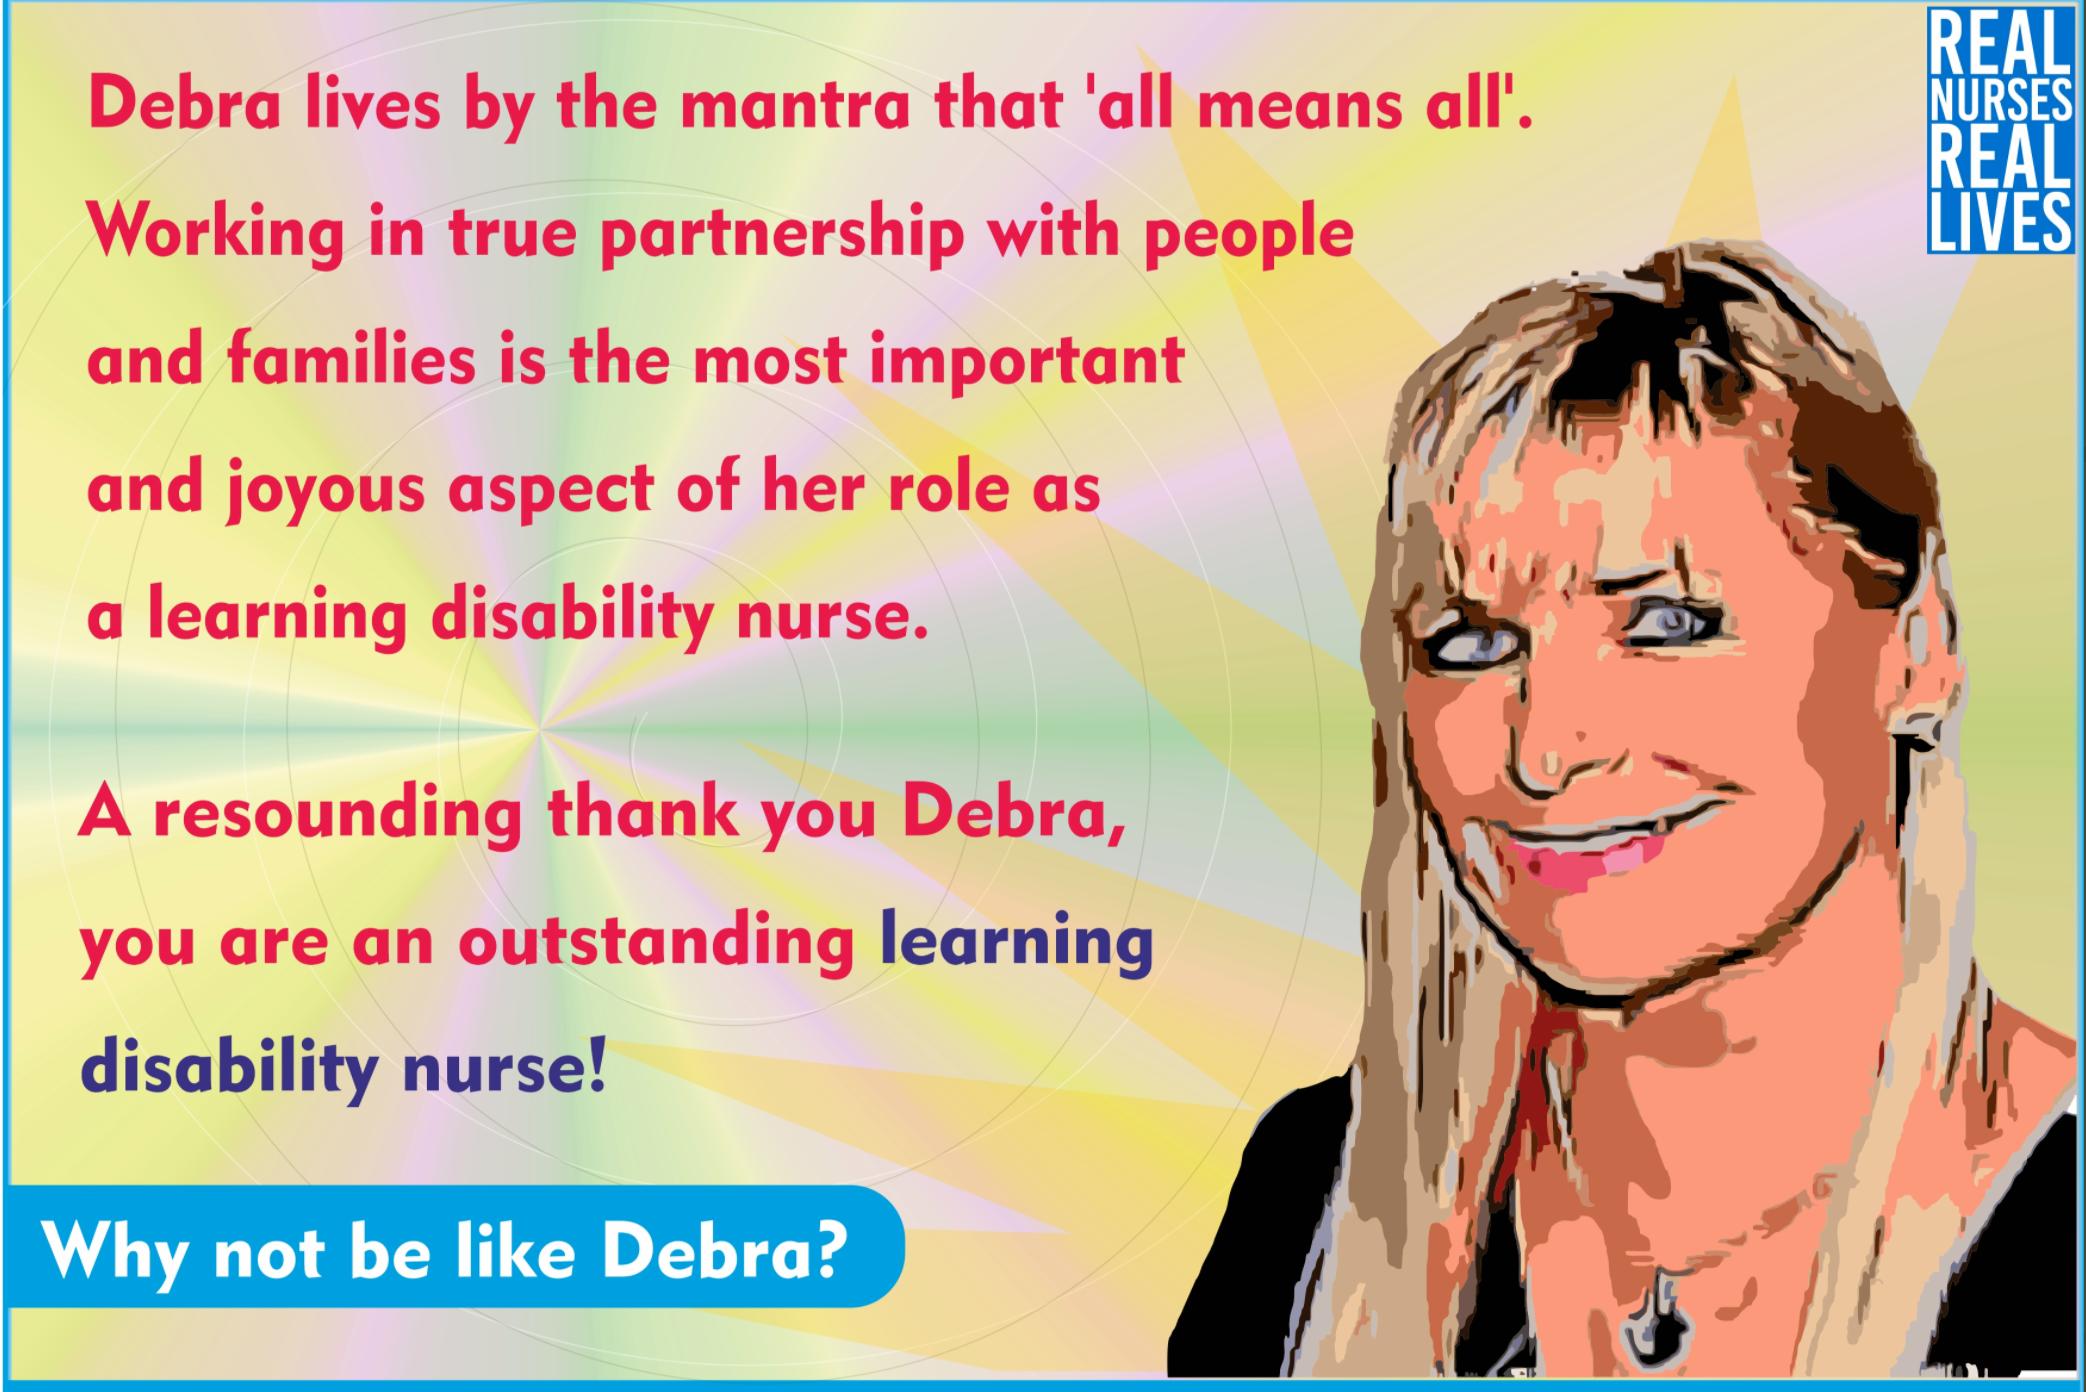 Real Nurses, Real Lives postcard